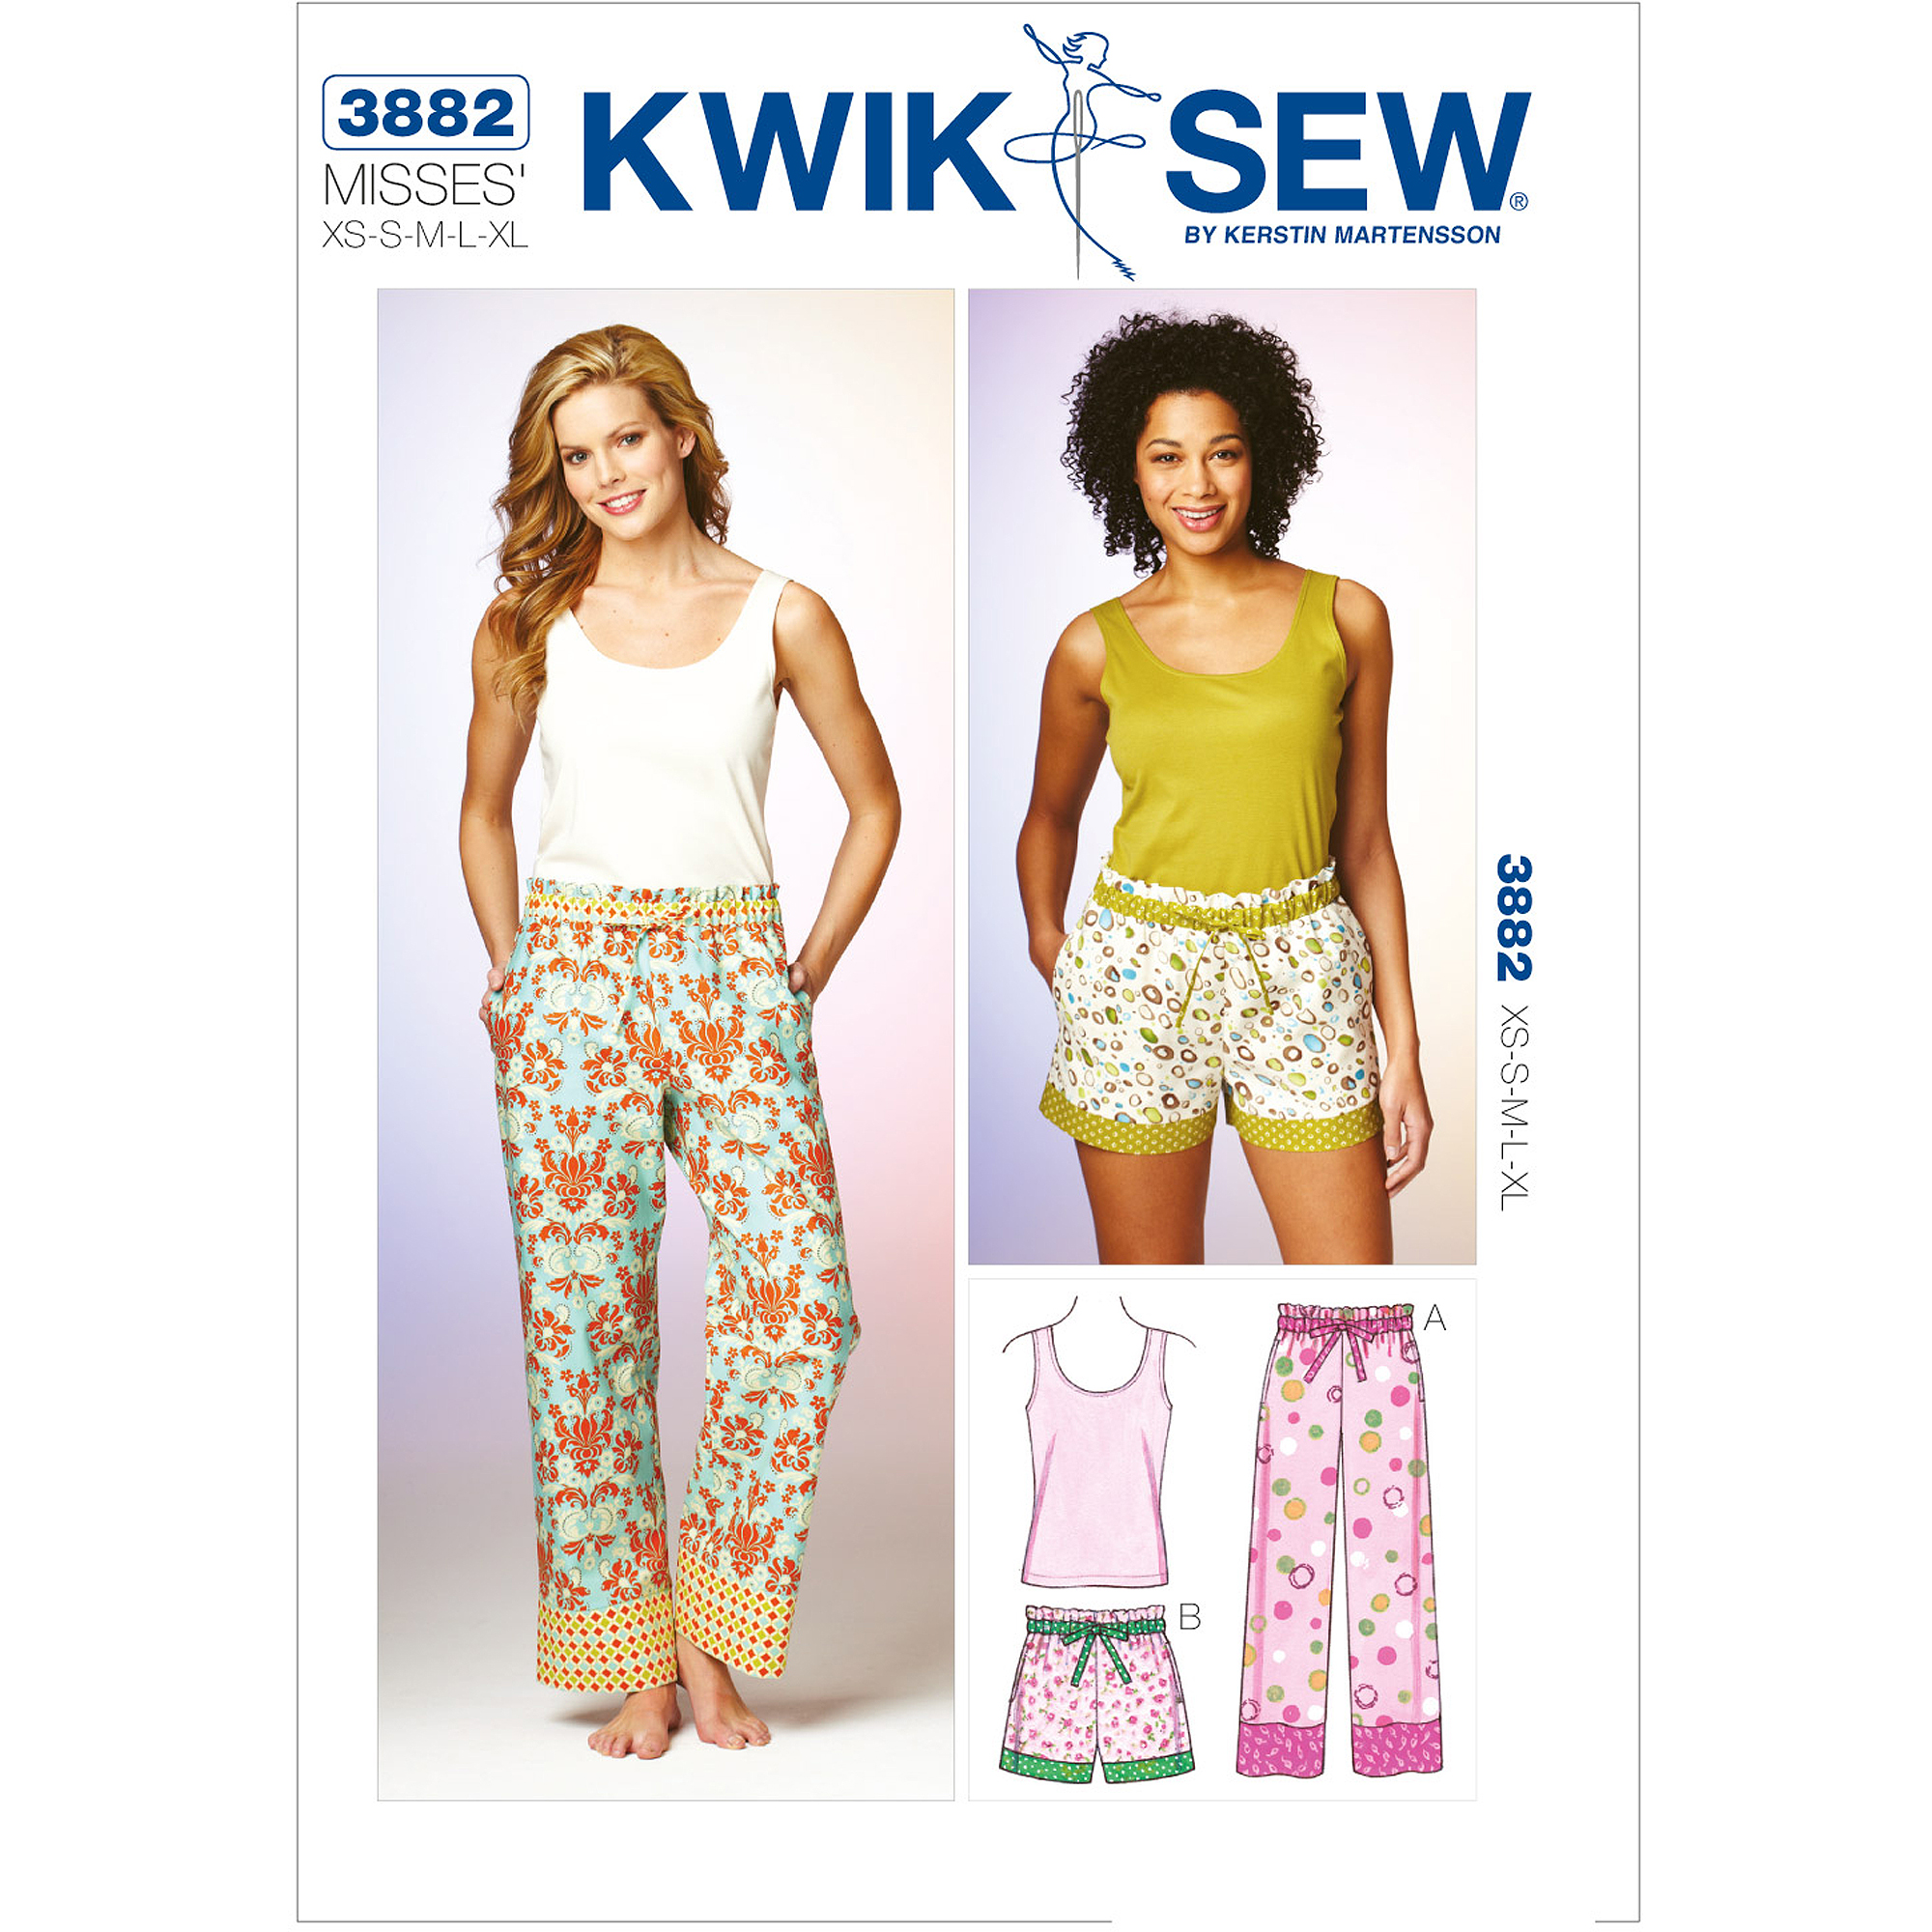 Kwik Sew Pattern Sleep Pants, Shorts and Top, (XS, S, M, L, XL)